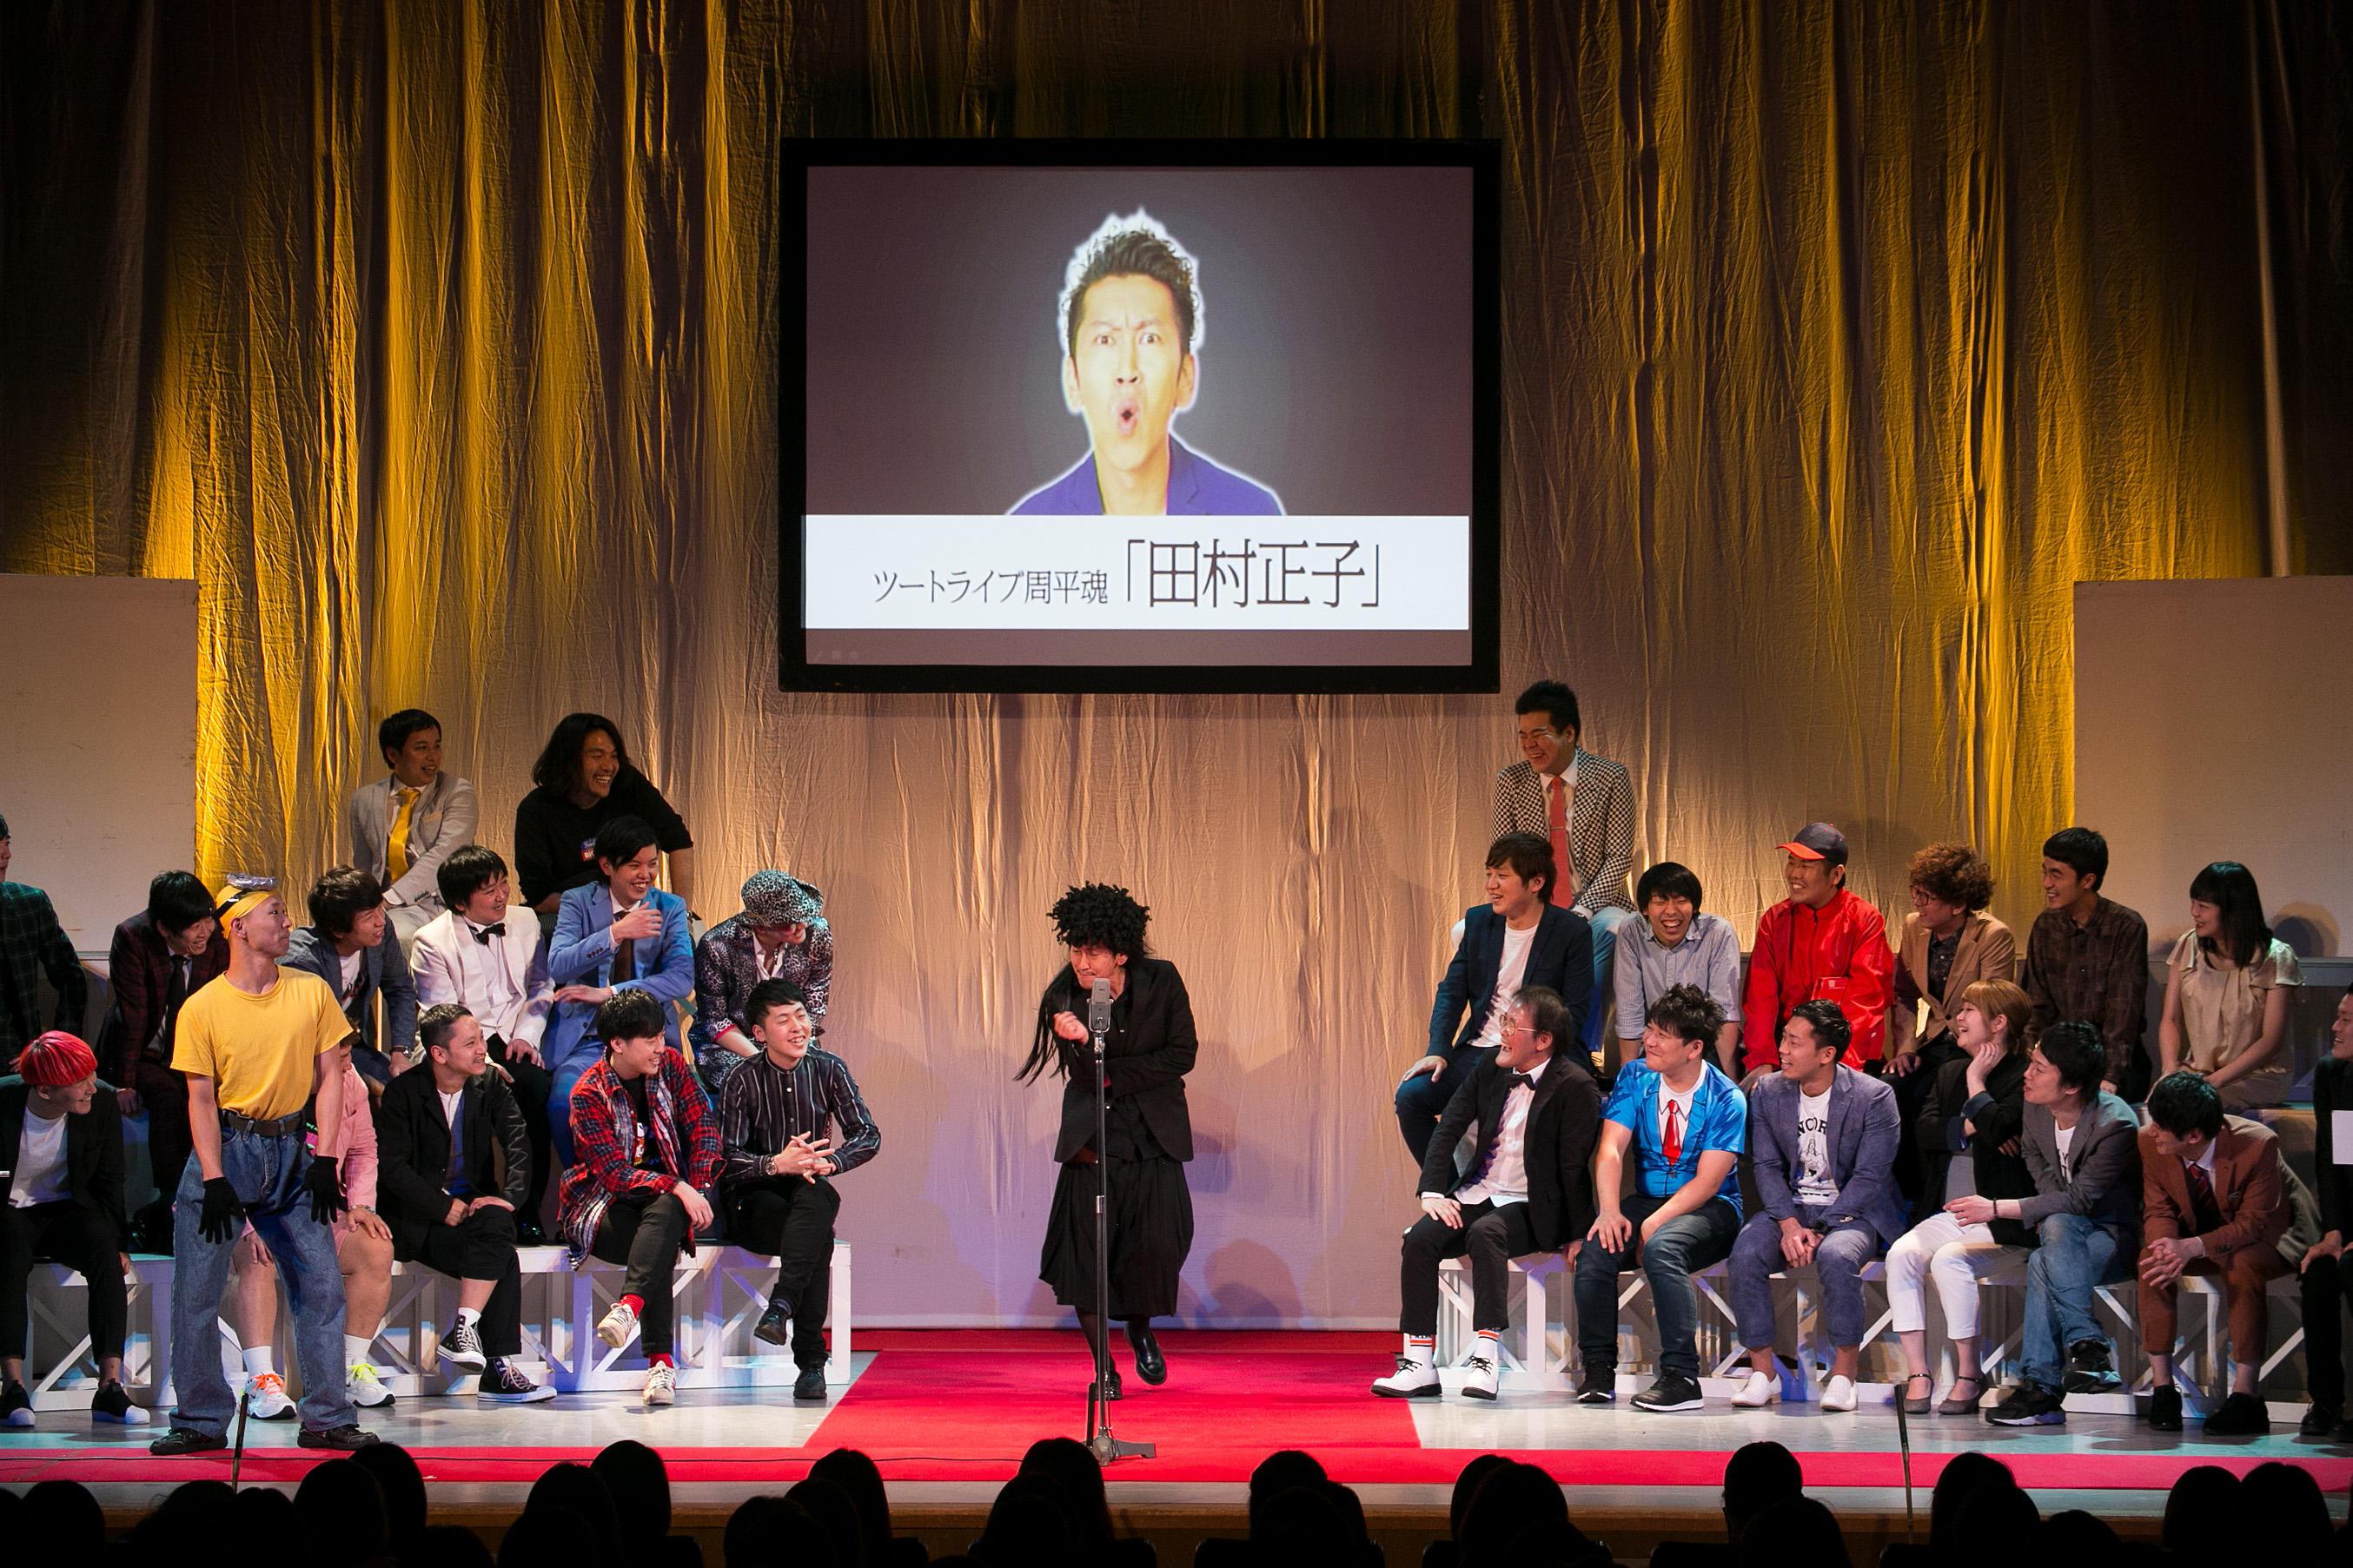 http://news.yoshimoto.co.jp/20181228112715-9ac0875501513f73ee5160f65d2c482657cb6ed8.jpg